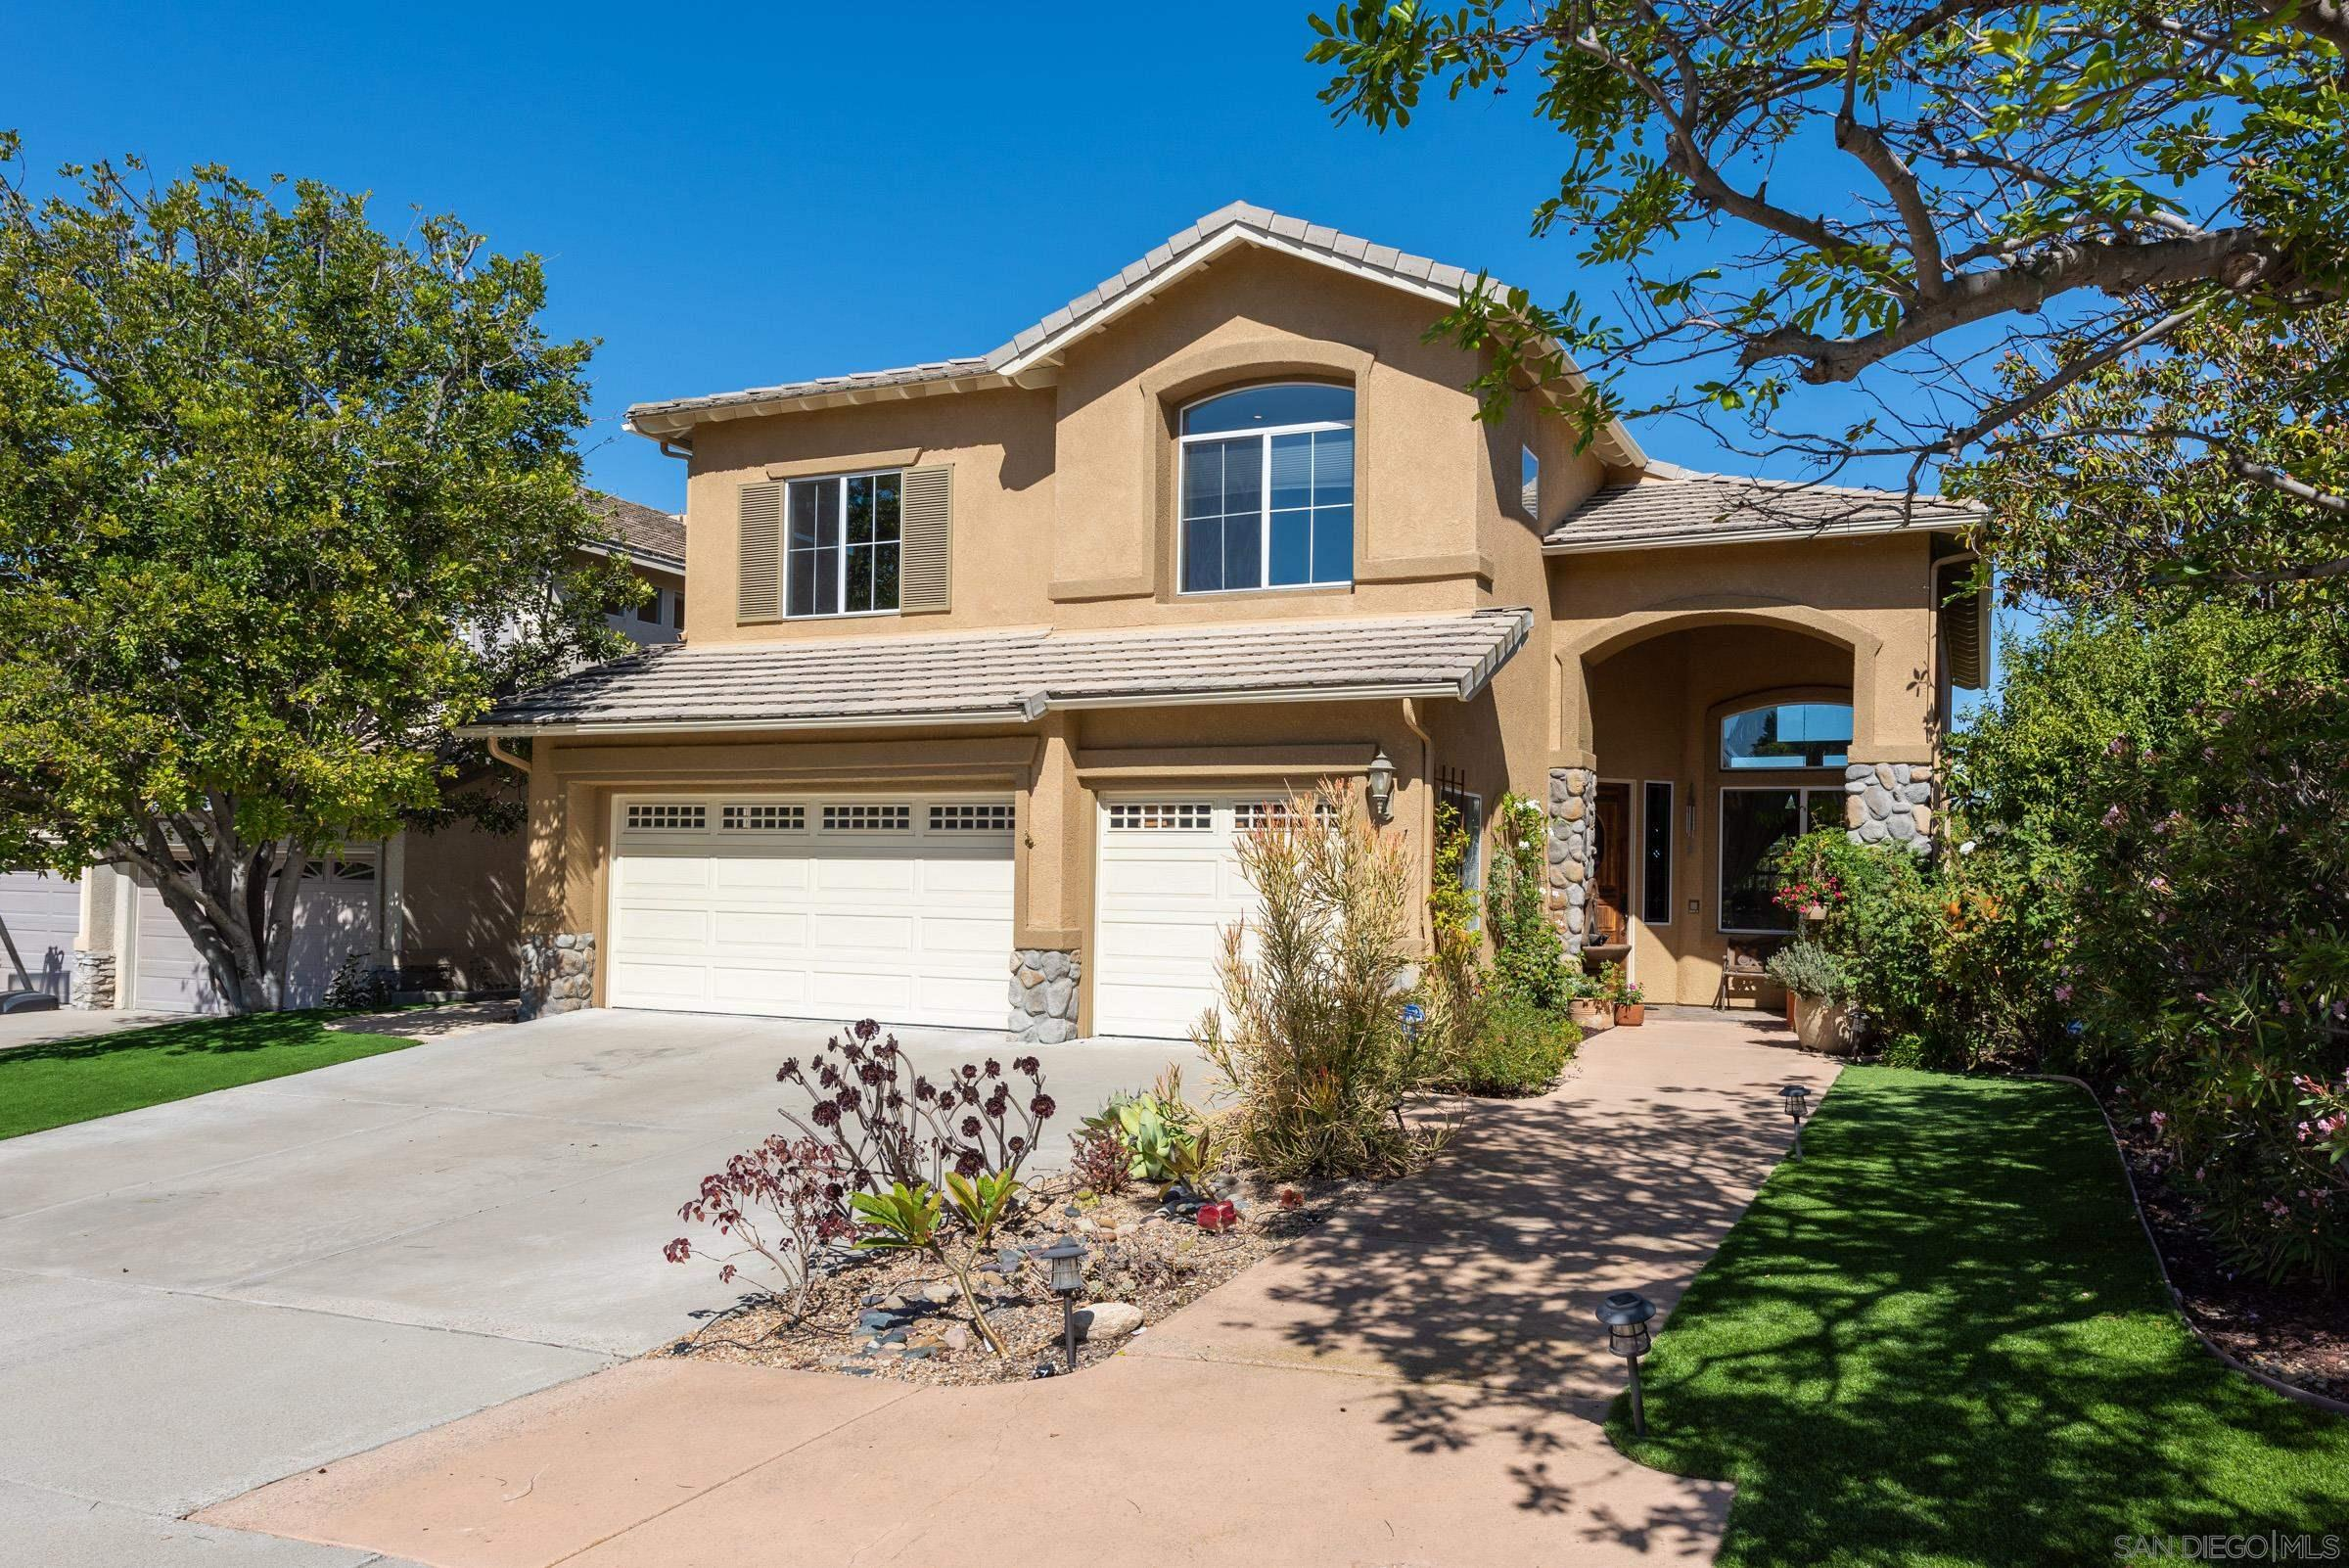 11030 Poinsett Rd, San Diego, CA 92131